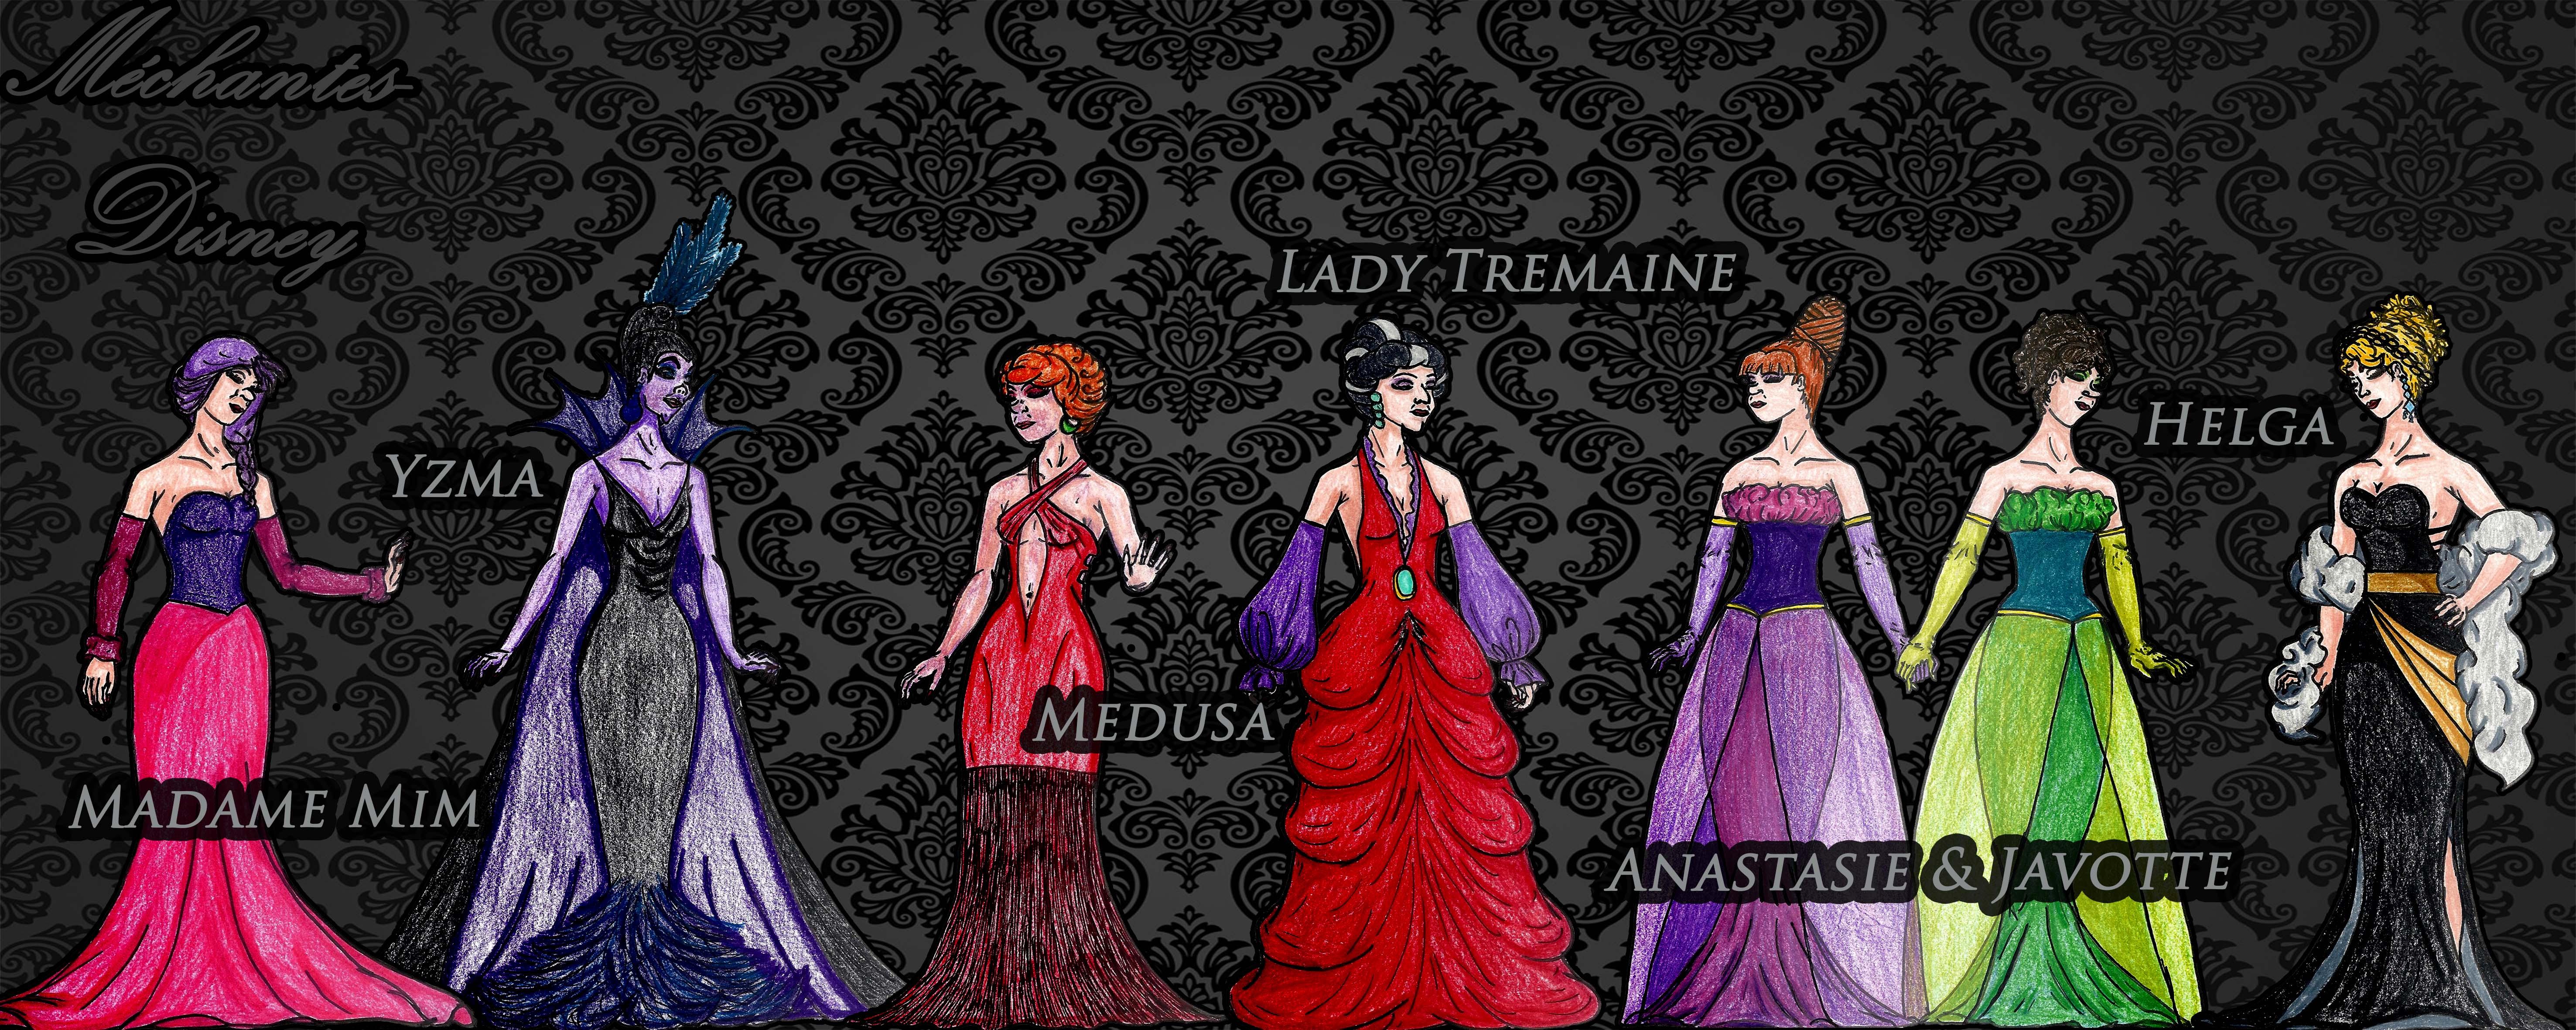 disneys villains designer collection by tiagostories on